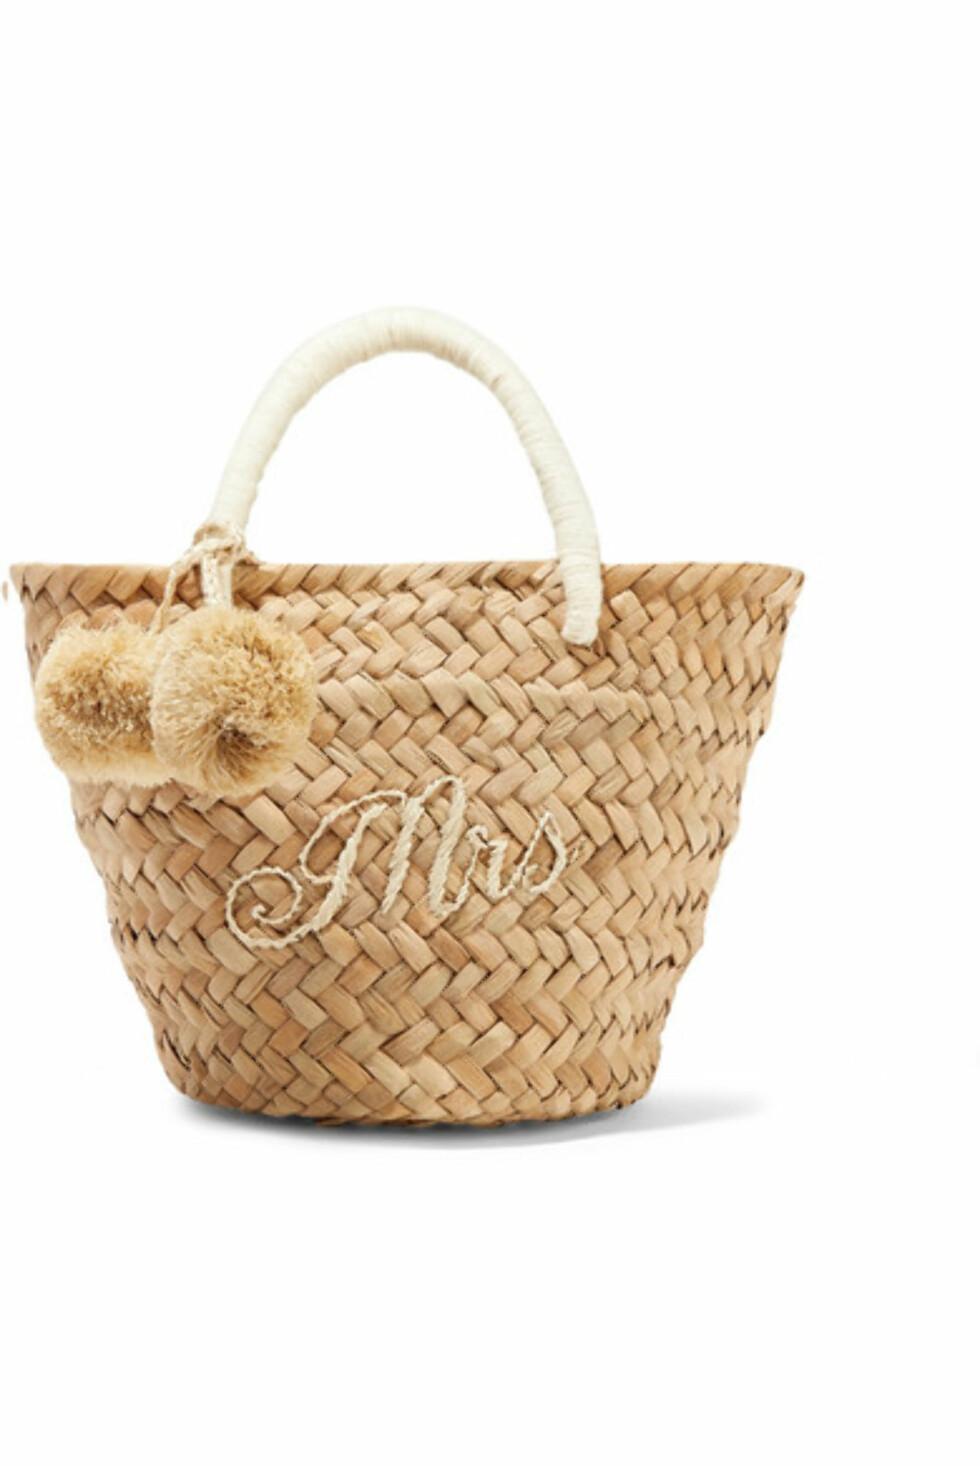 Veske fra Kayu via Net-a-porter.com  1060,-  https://www.net-a-porter.com/no/en/product/1046447/kayu/st-tropez-mini-pompom-embellished-embroidered-woven-straw-tote